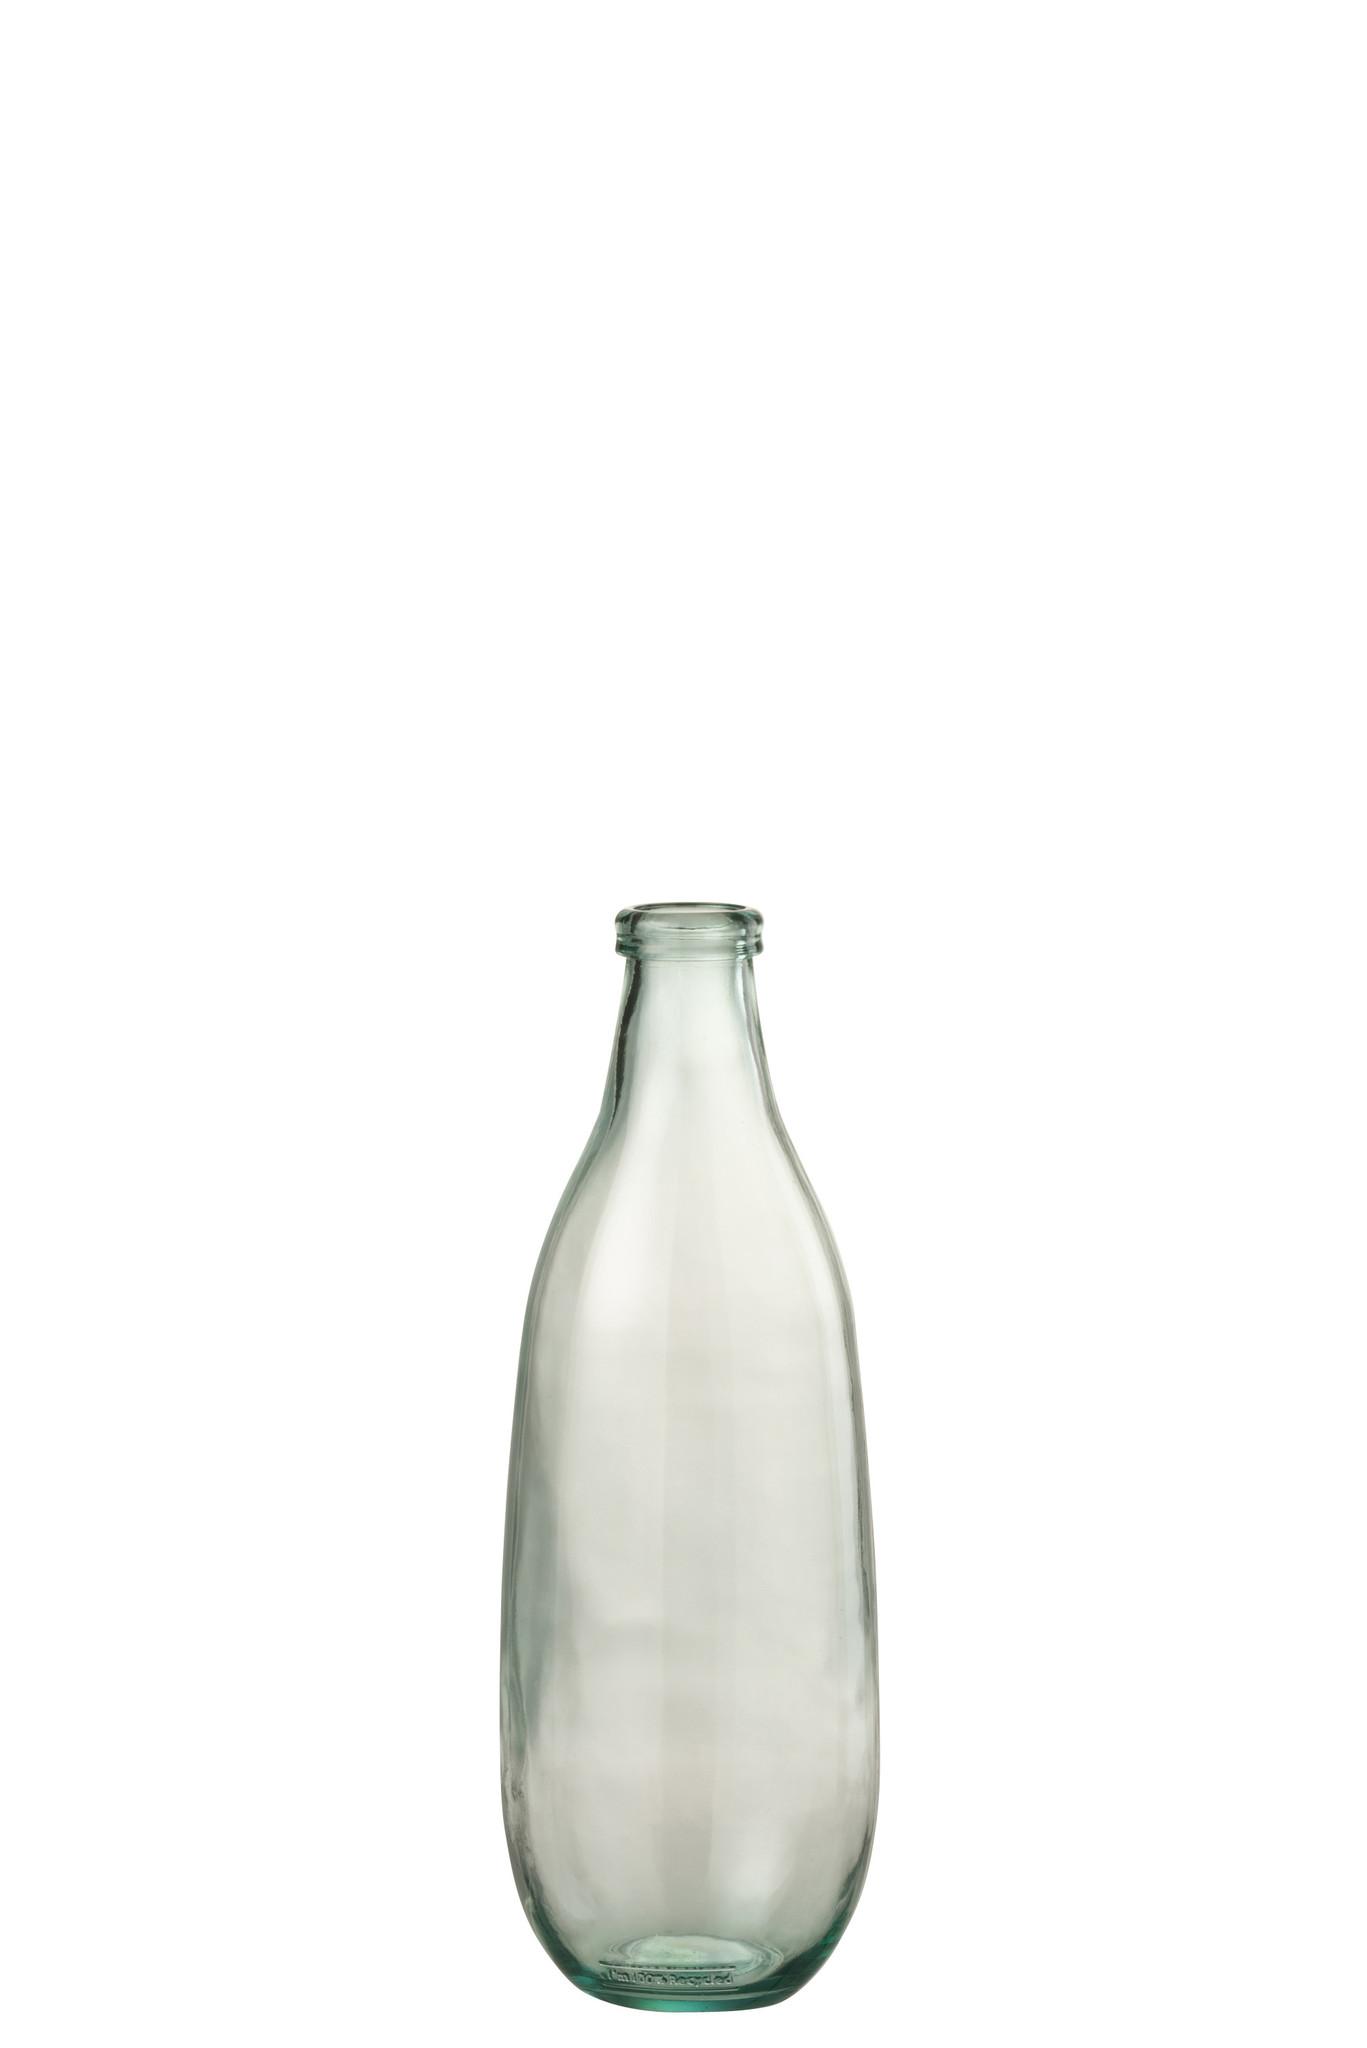 Vaas Fles Glas Transparant-1